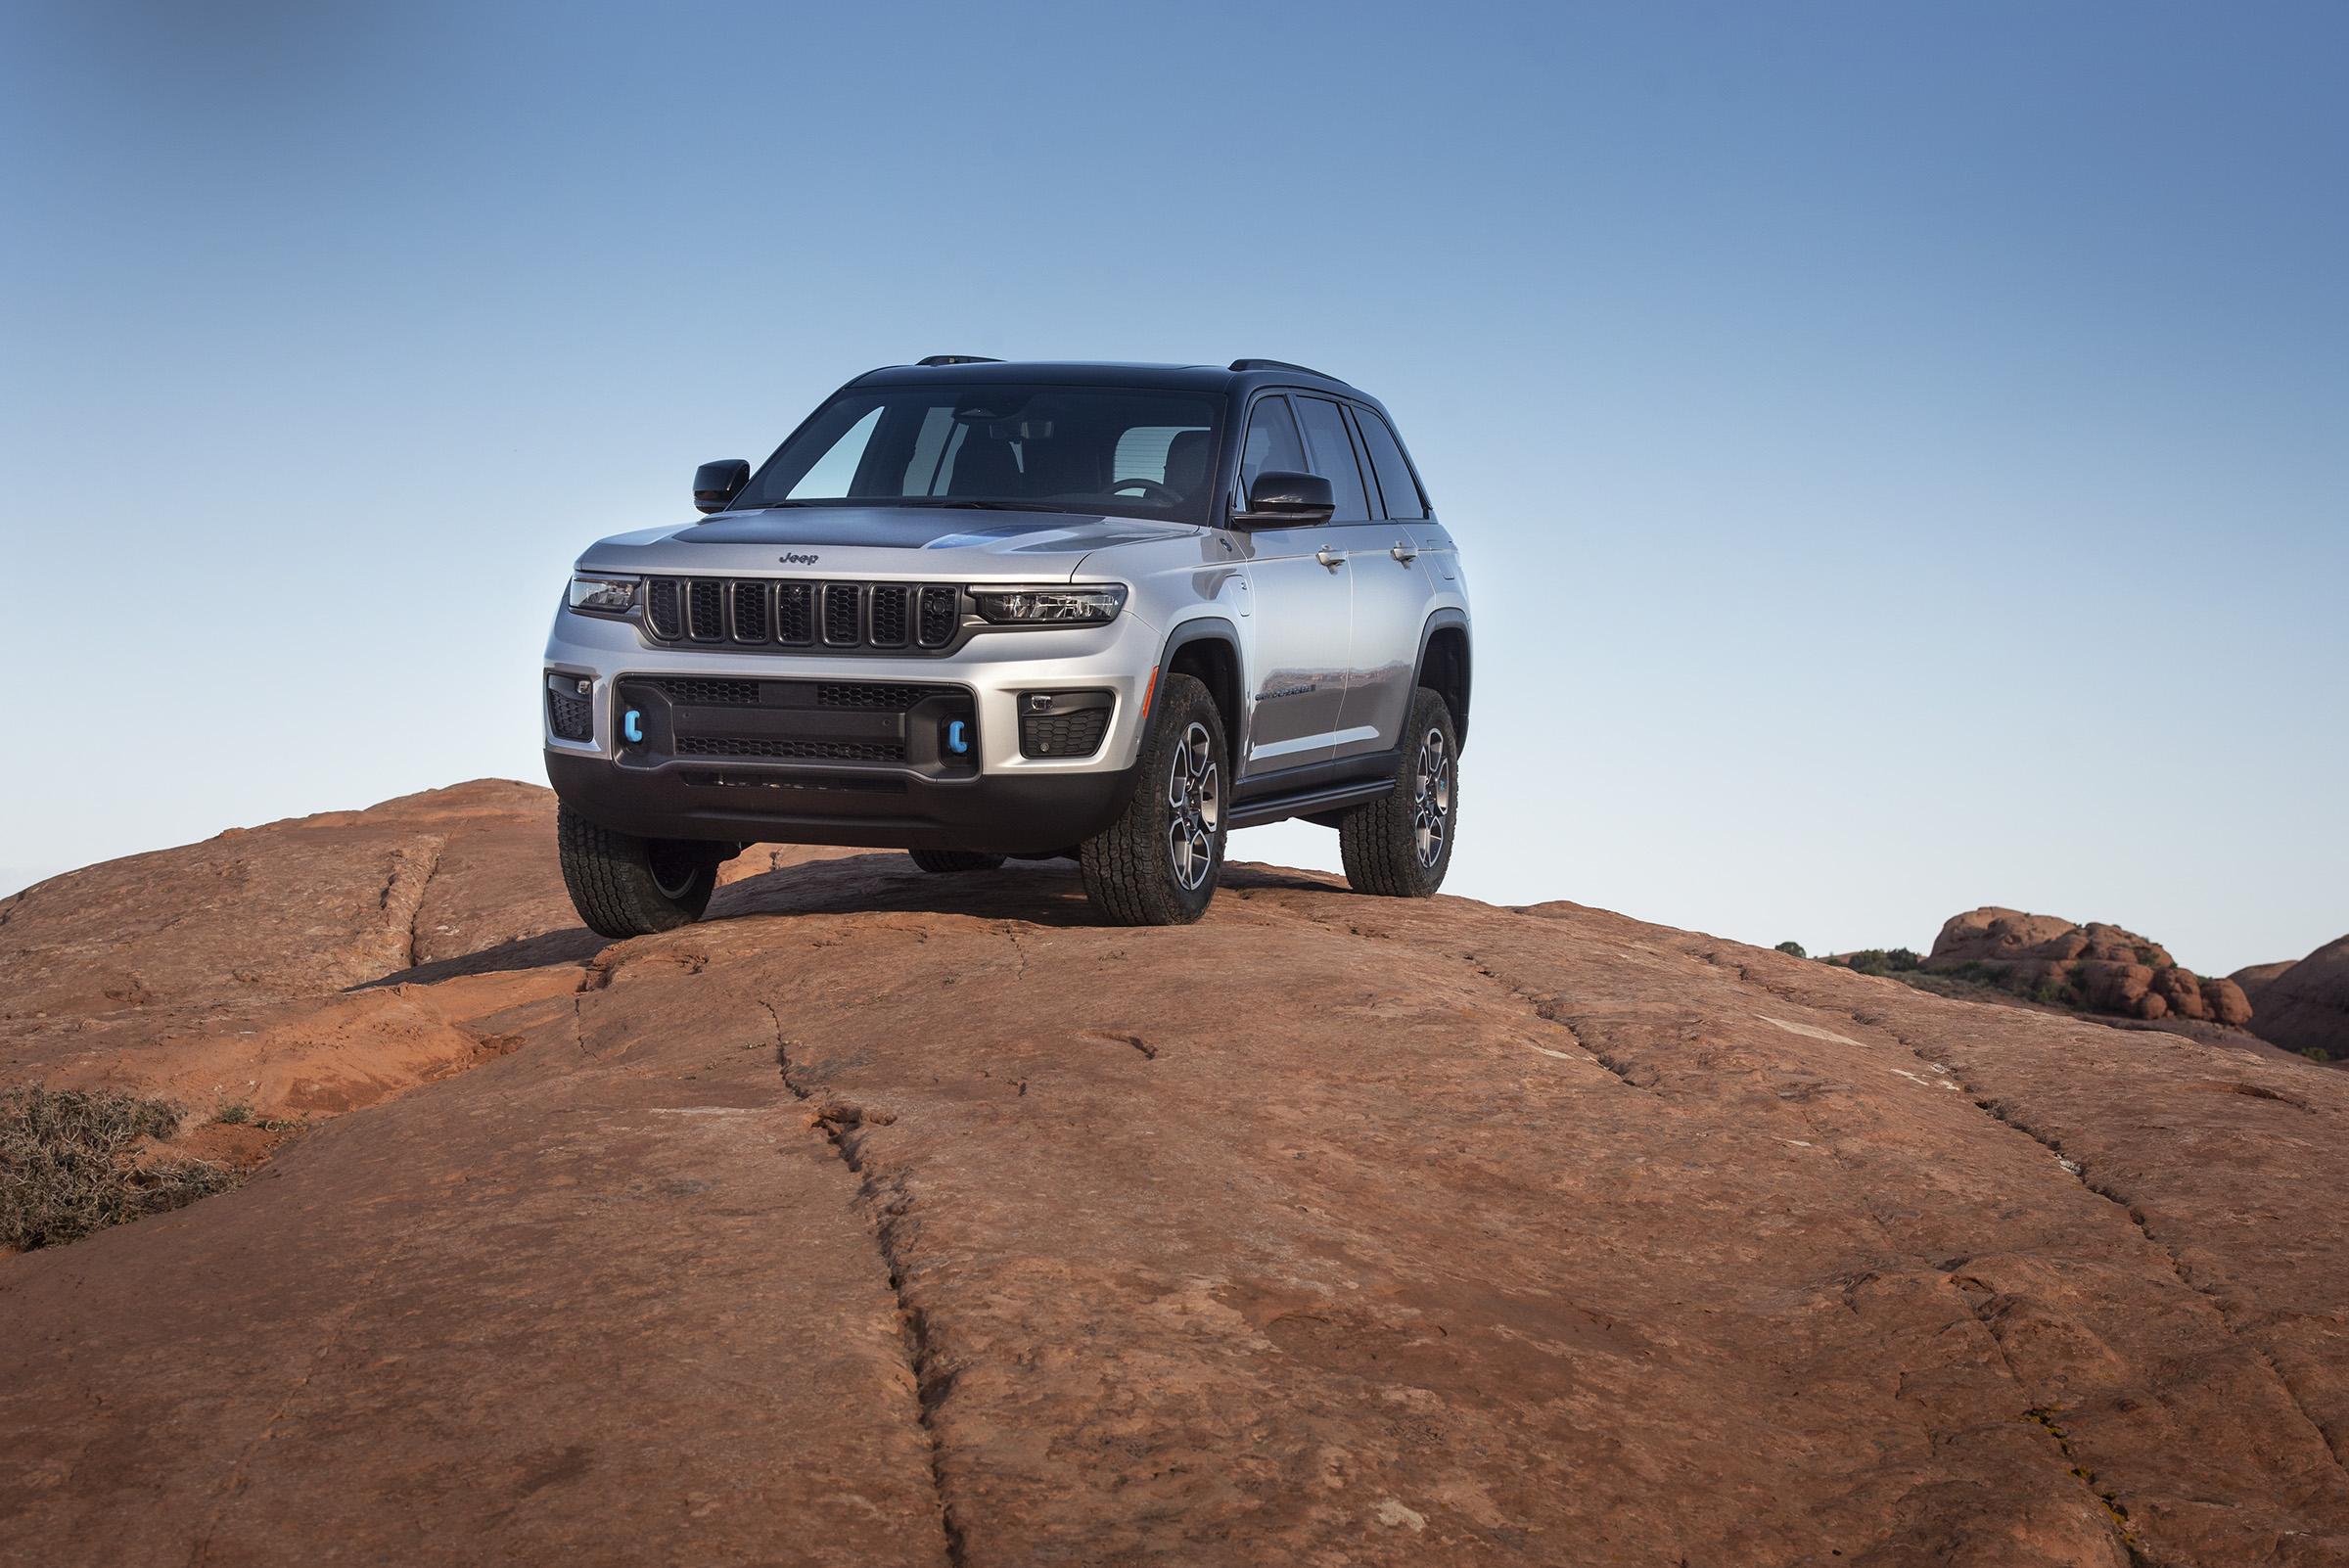 2022 Jeep Grand Cherokee Trailhawk 4xe front three quarter on rocks